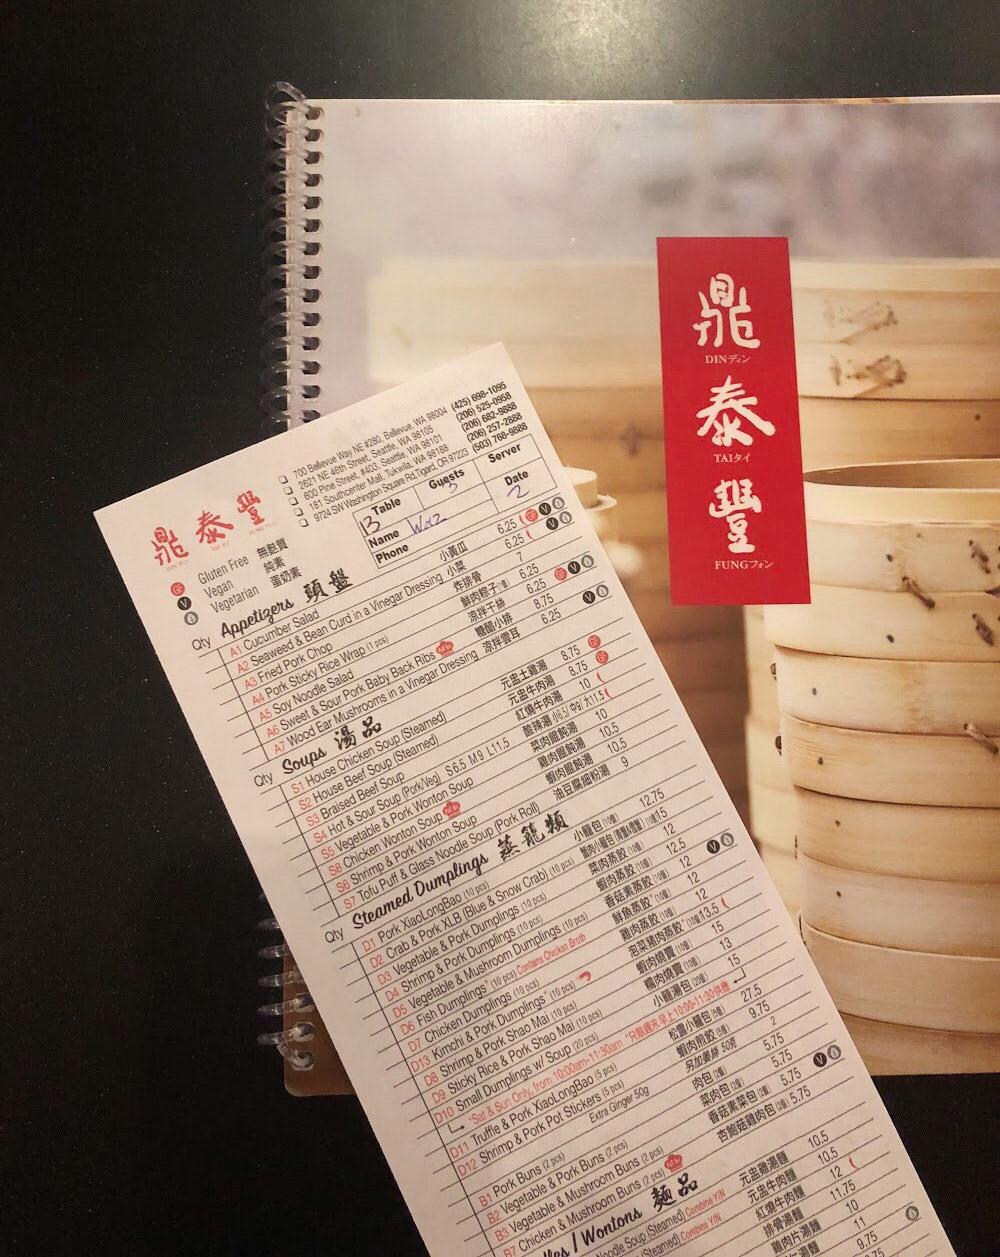 Din Tai Fung - Vegan Vegetarian Gluten-Free Menu